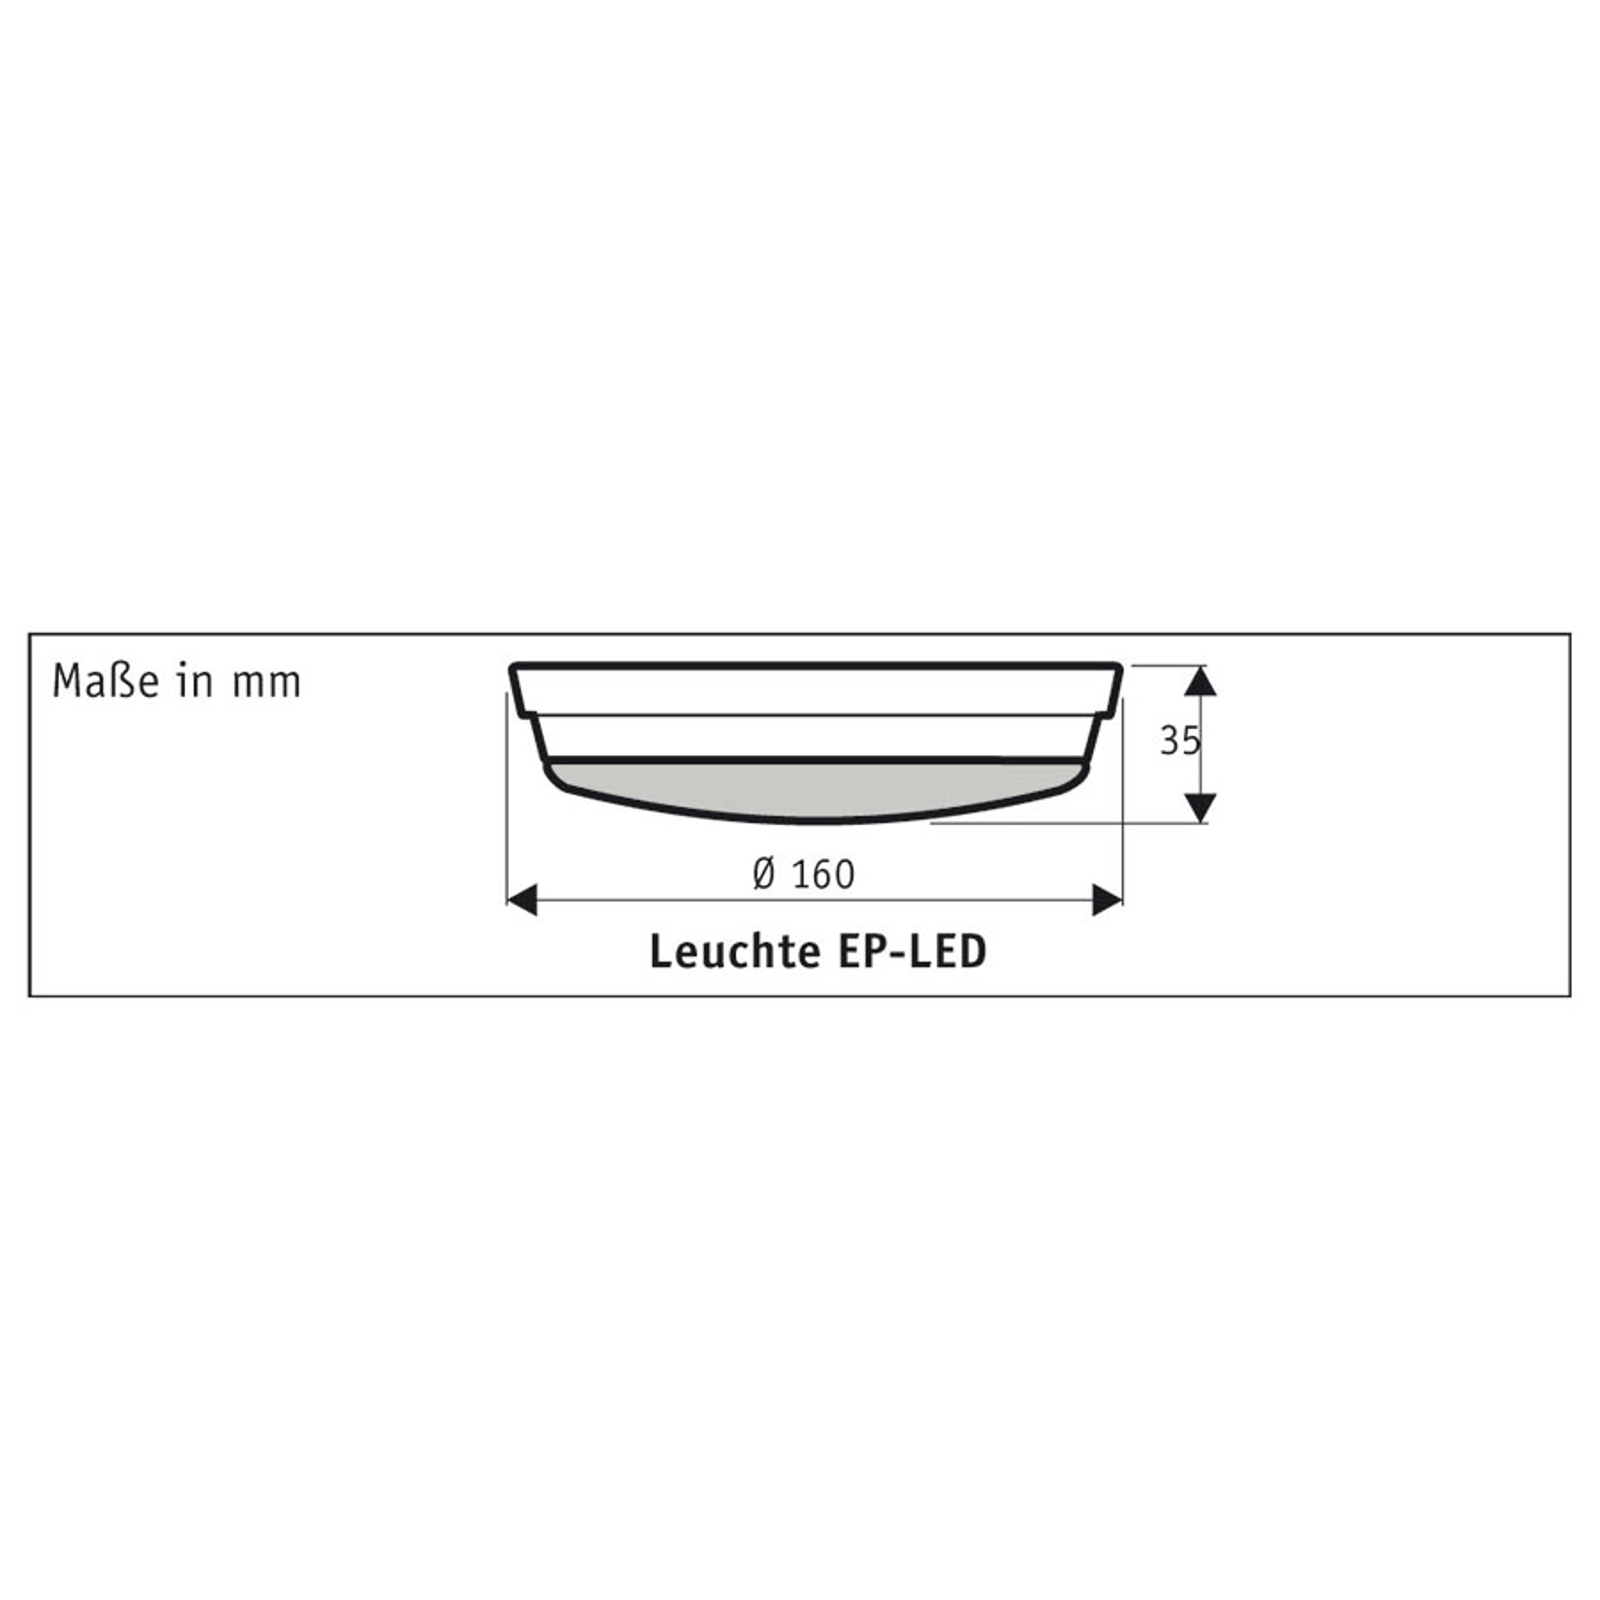 Kit LED atenuable ventilador Eco Plano II, basalto